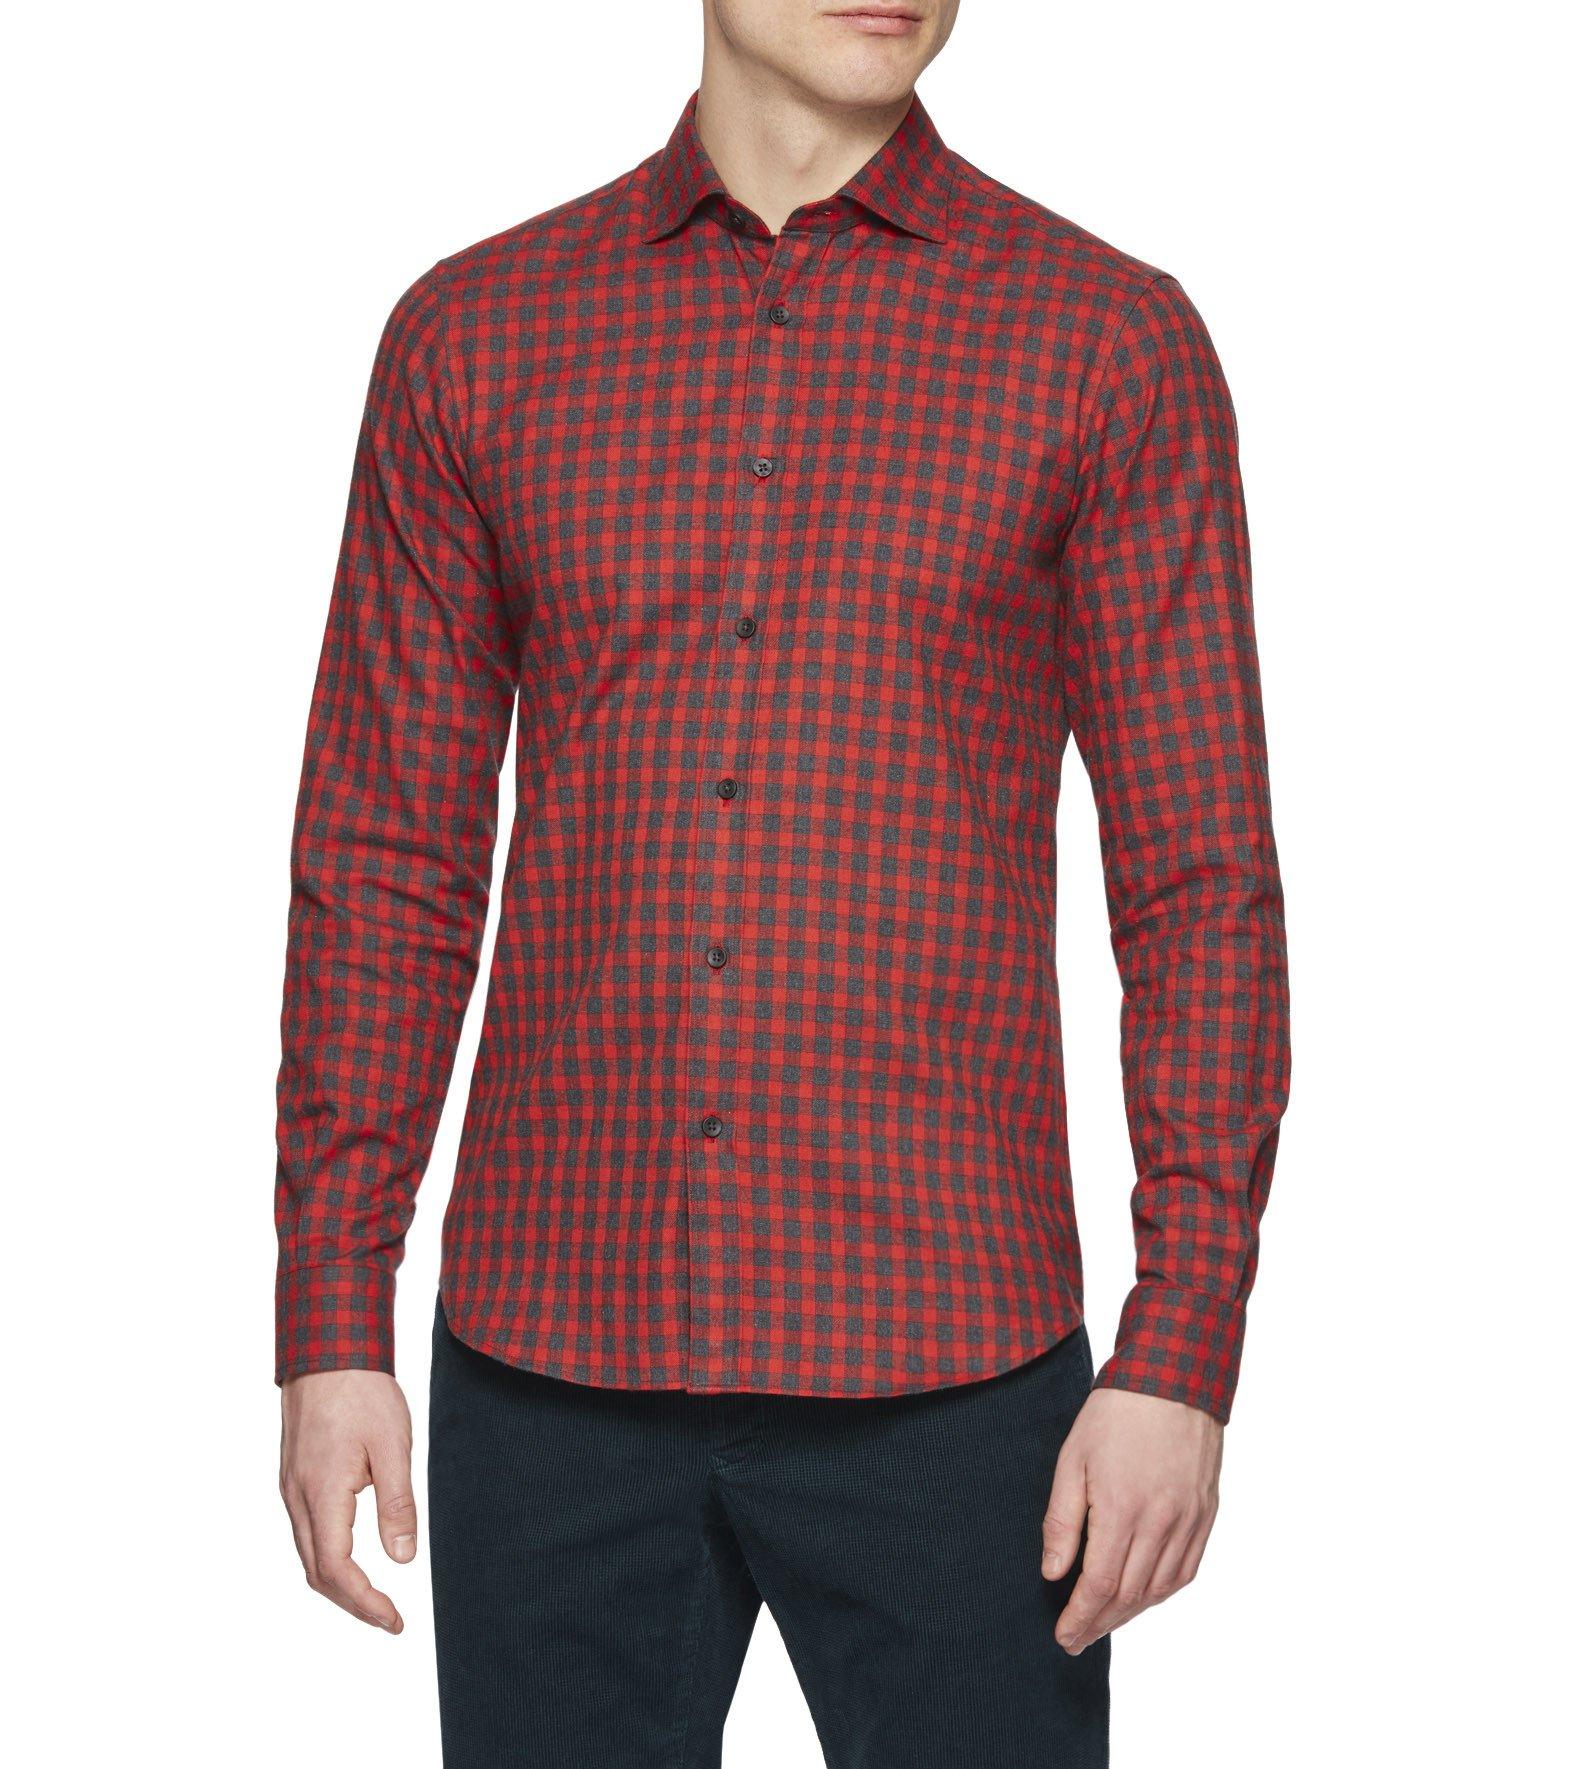 ermenegildo zegna red blue washed macro check shirt in blue for men red lyst. Black Bedroom Furniture Sets. Home Design Ideas